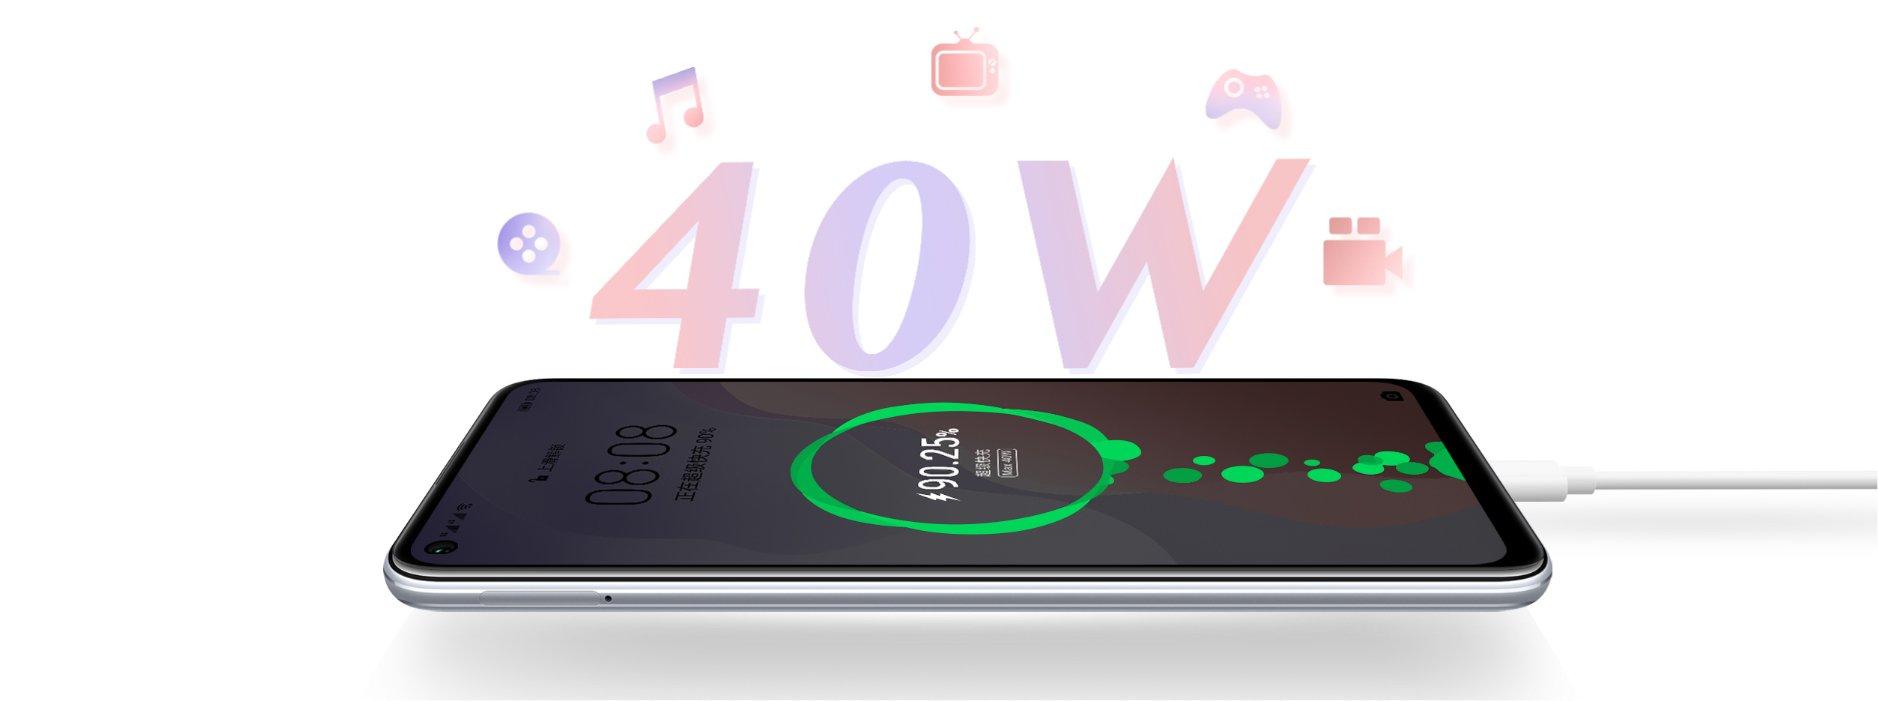 Huawei Smartphone Nova 7SE Space Silver (HMS)